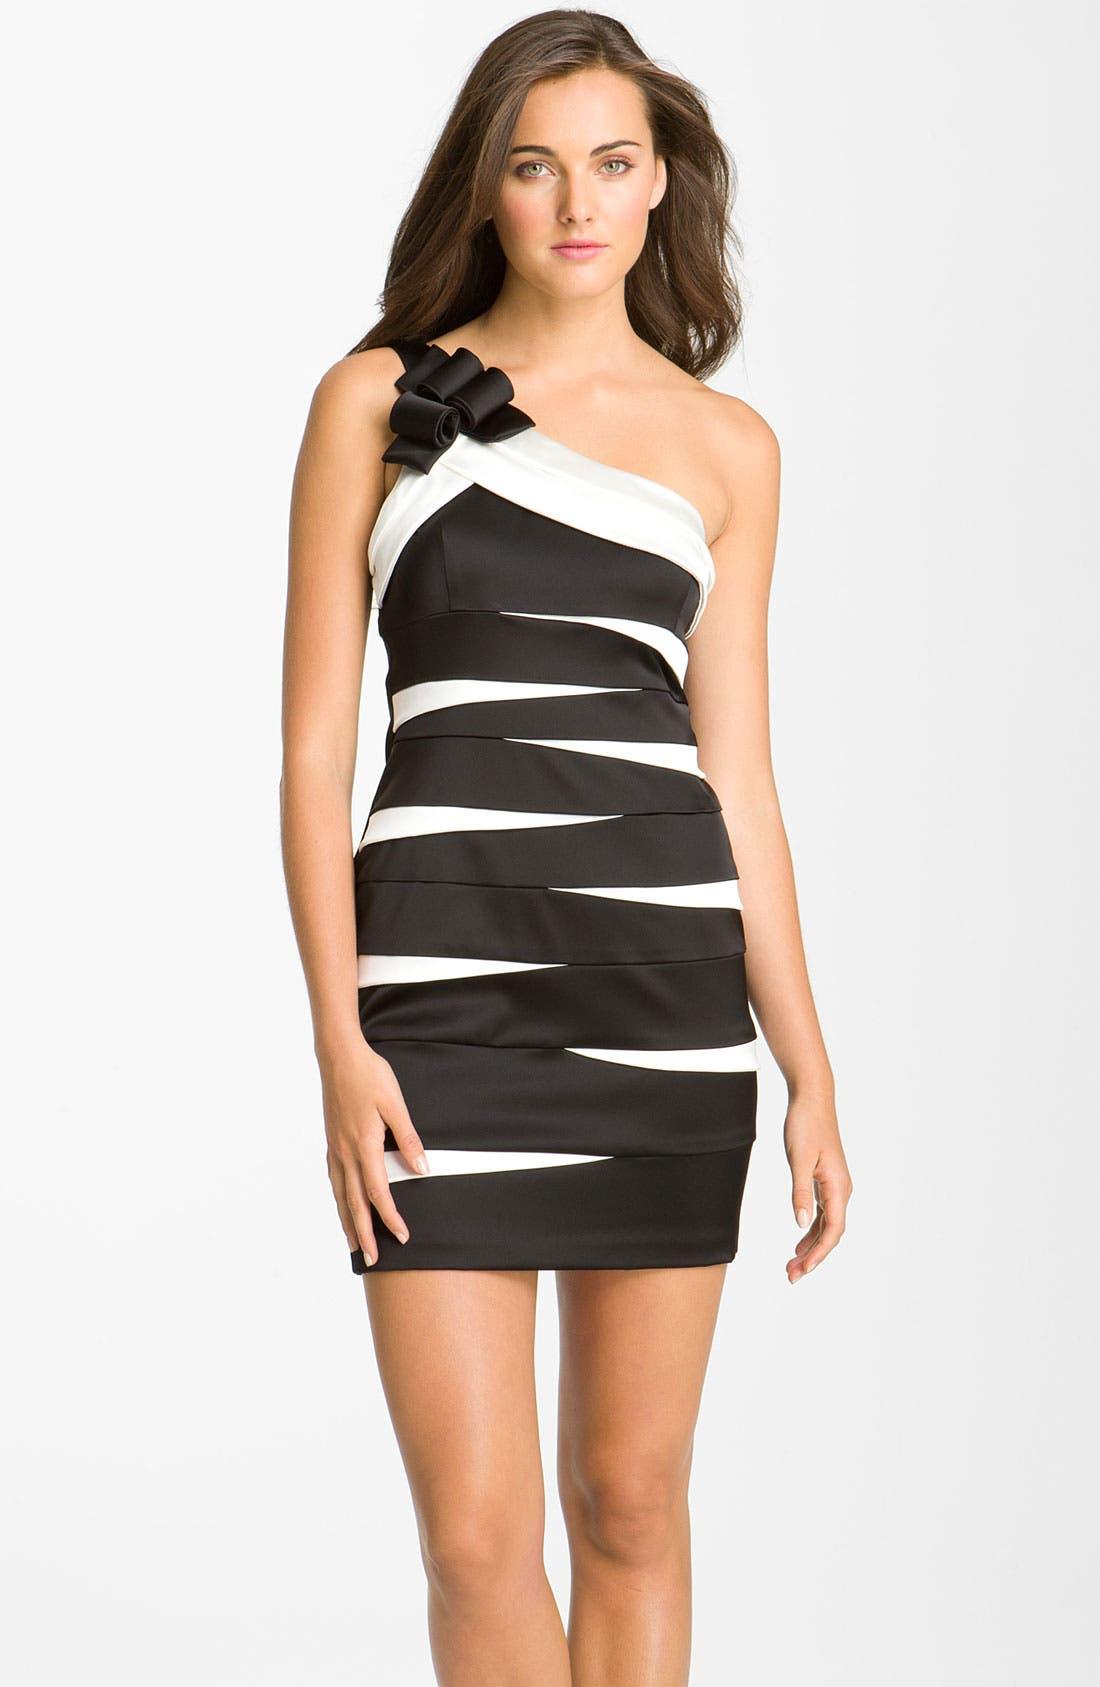 Alternate Image 1 Selected - Betsy & Adam One Shoulder Banded Satin Sheath Dress